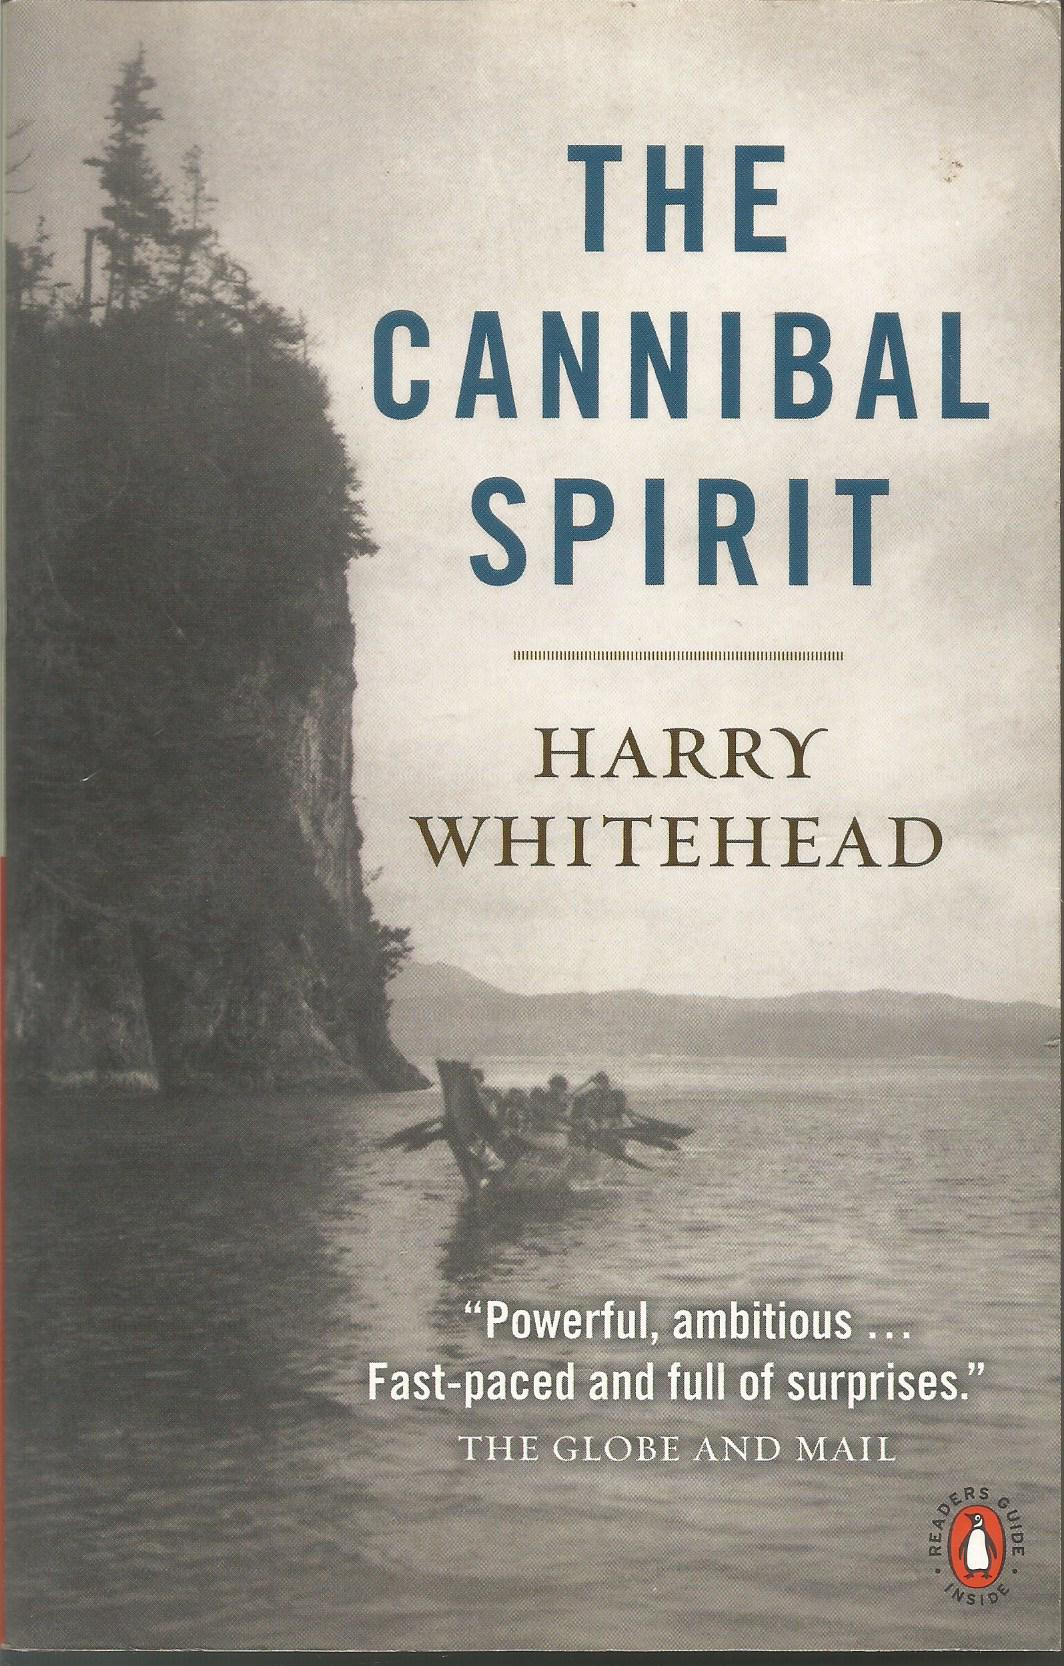 The Cannibal Spirit